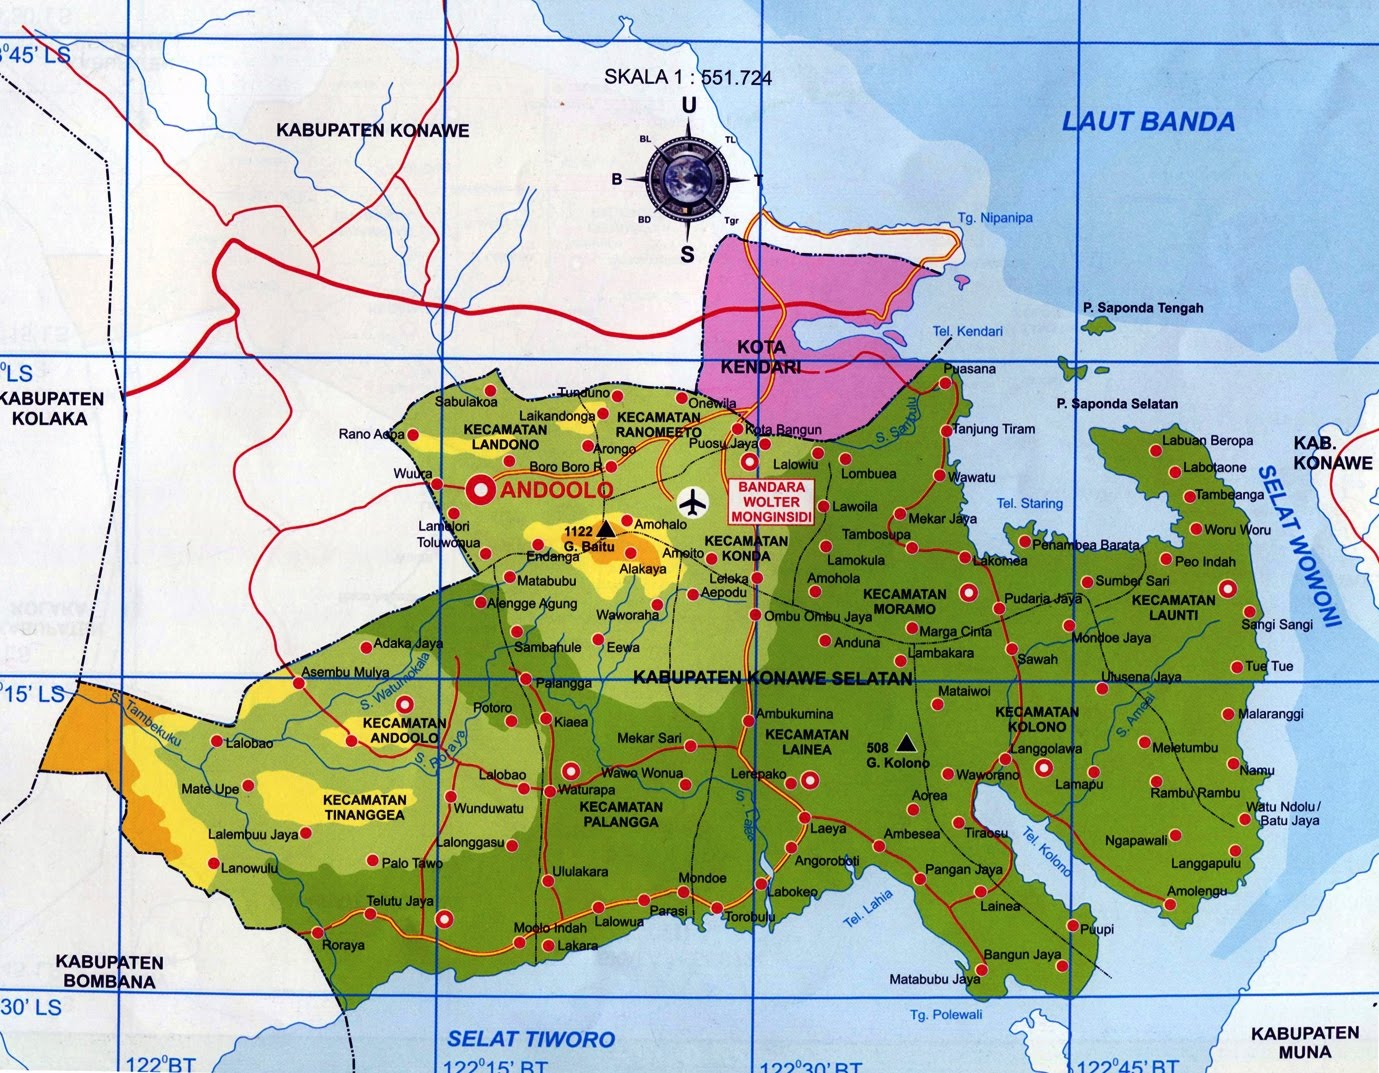 Profil Kabupaten Konawe Selatan Sulawesi Tenggara | DESA ...